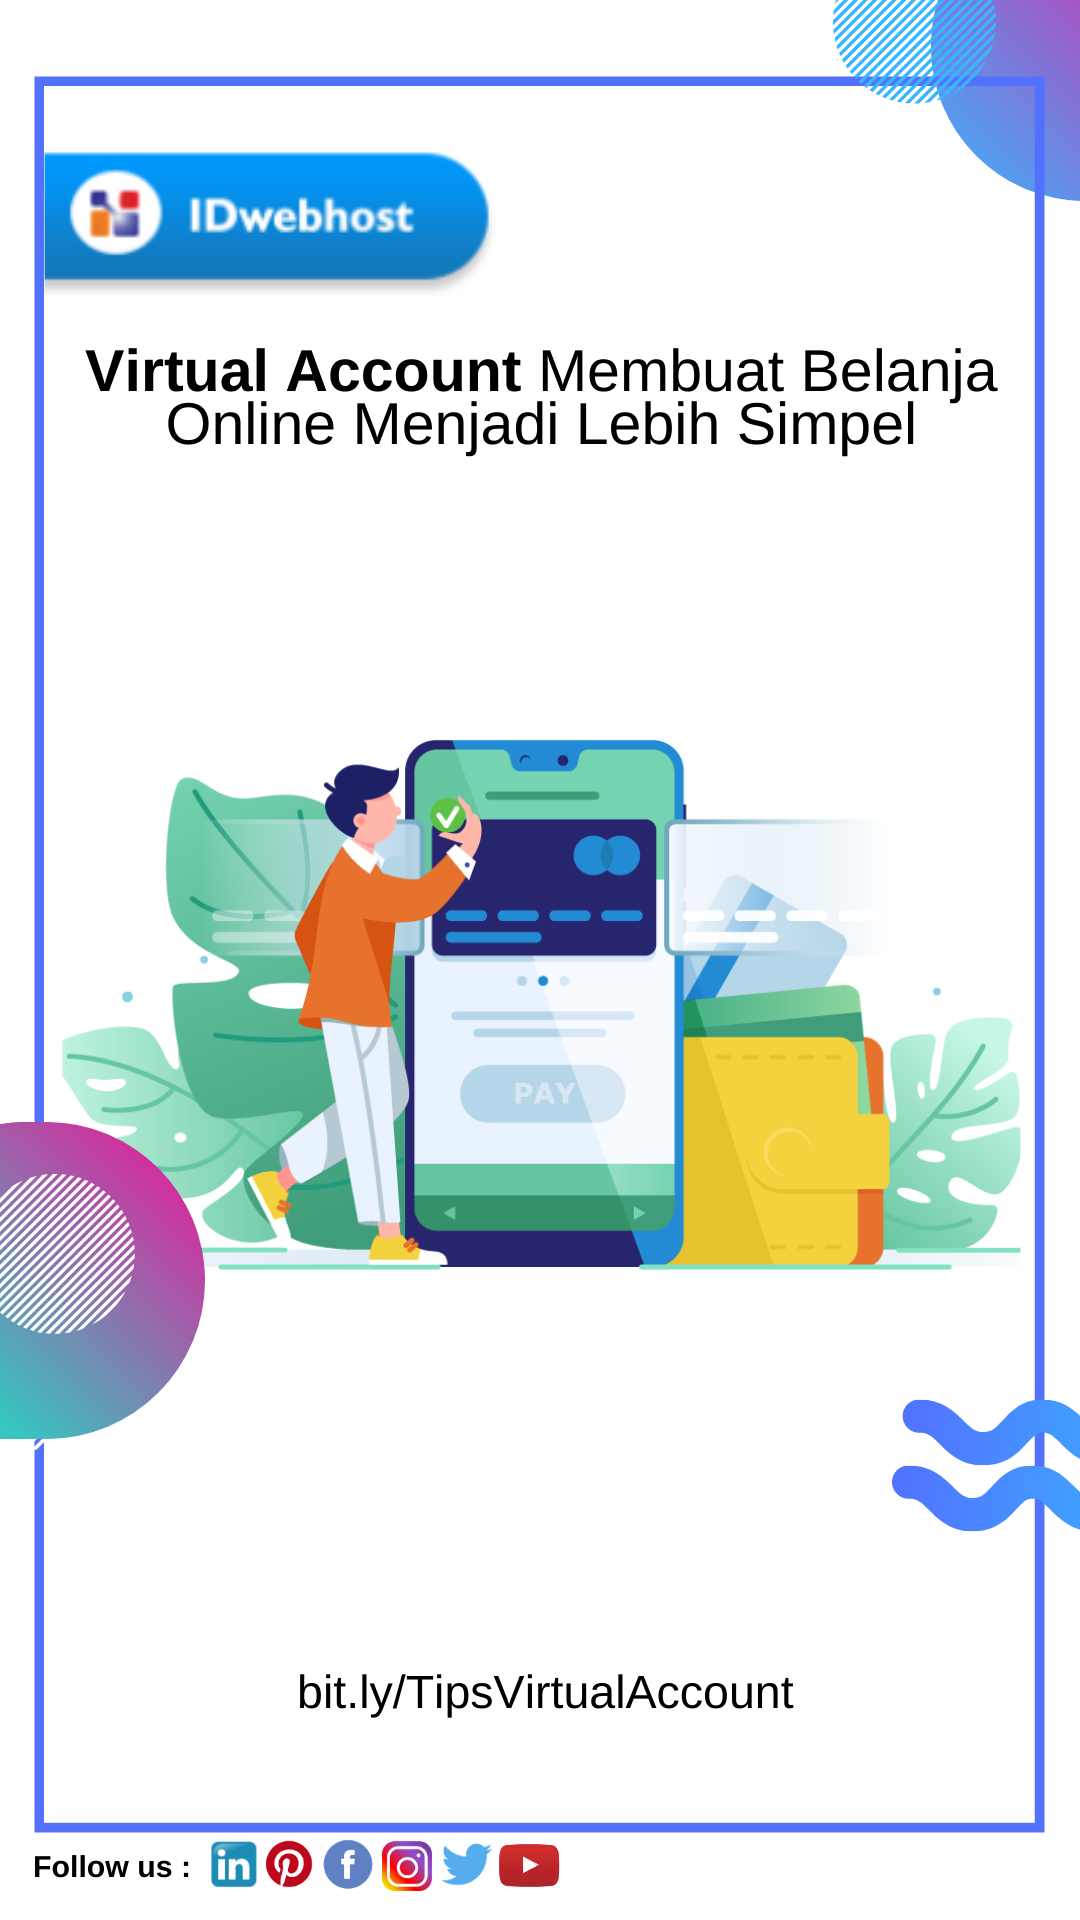 Virtual Account Membuat Belanja Online Menjadi Lebih Simpel Belanja E Commerce Pengikut